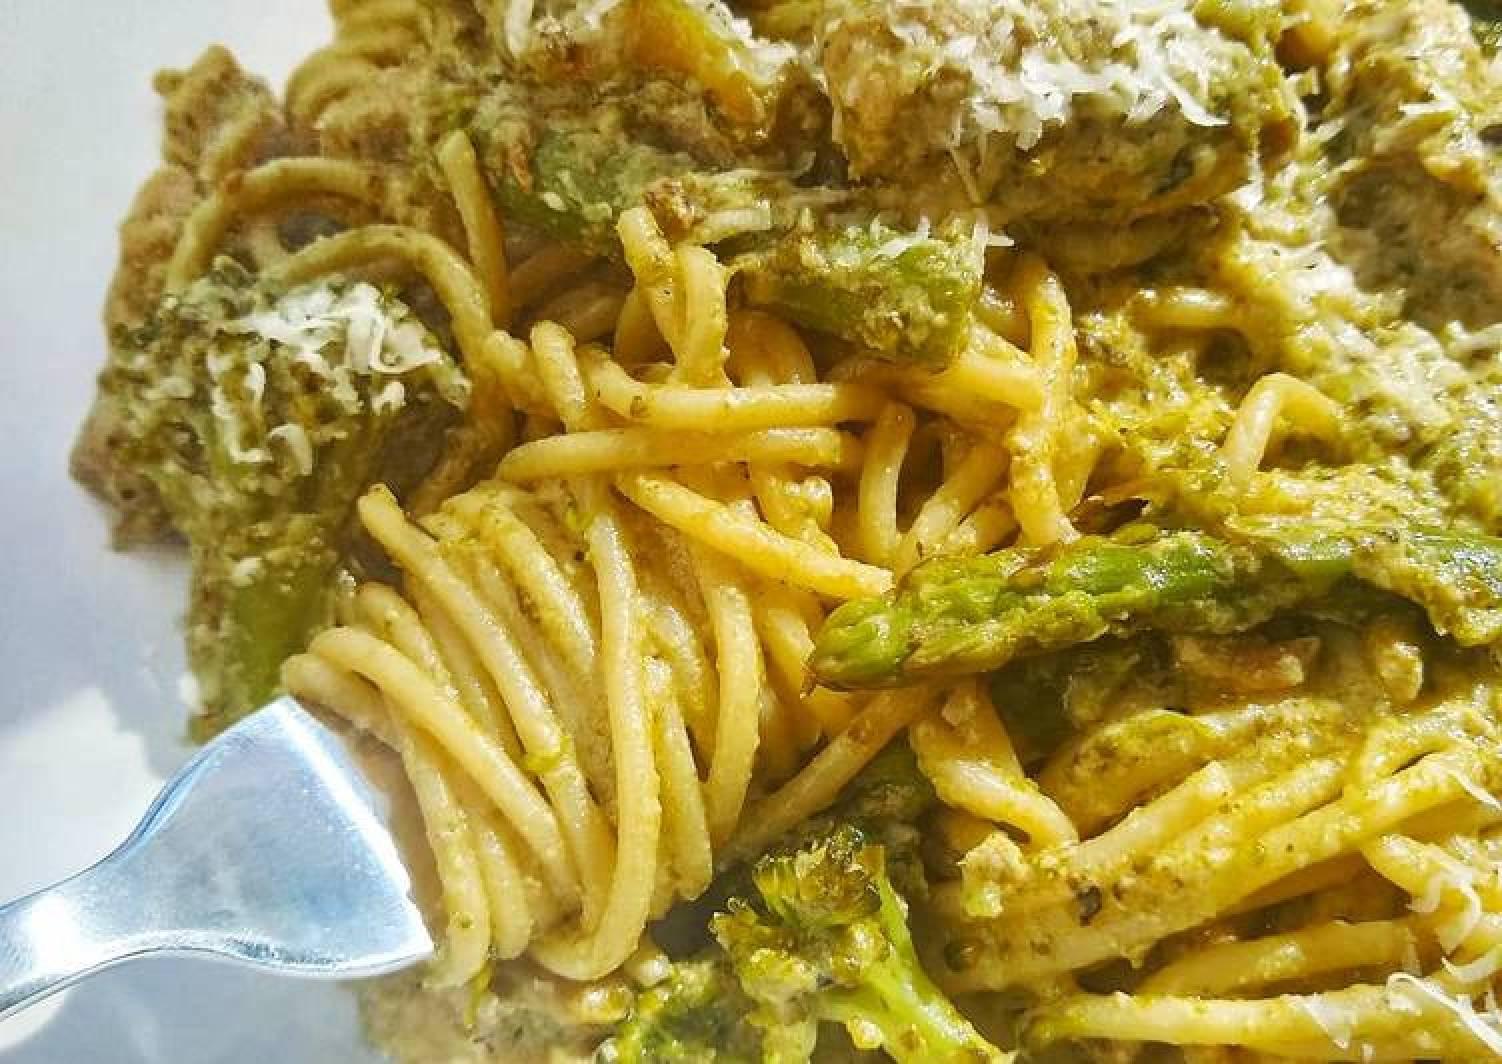 Creamy Pesto Pasta With Chicken, Asparagus & Brocolli